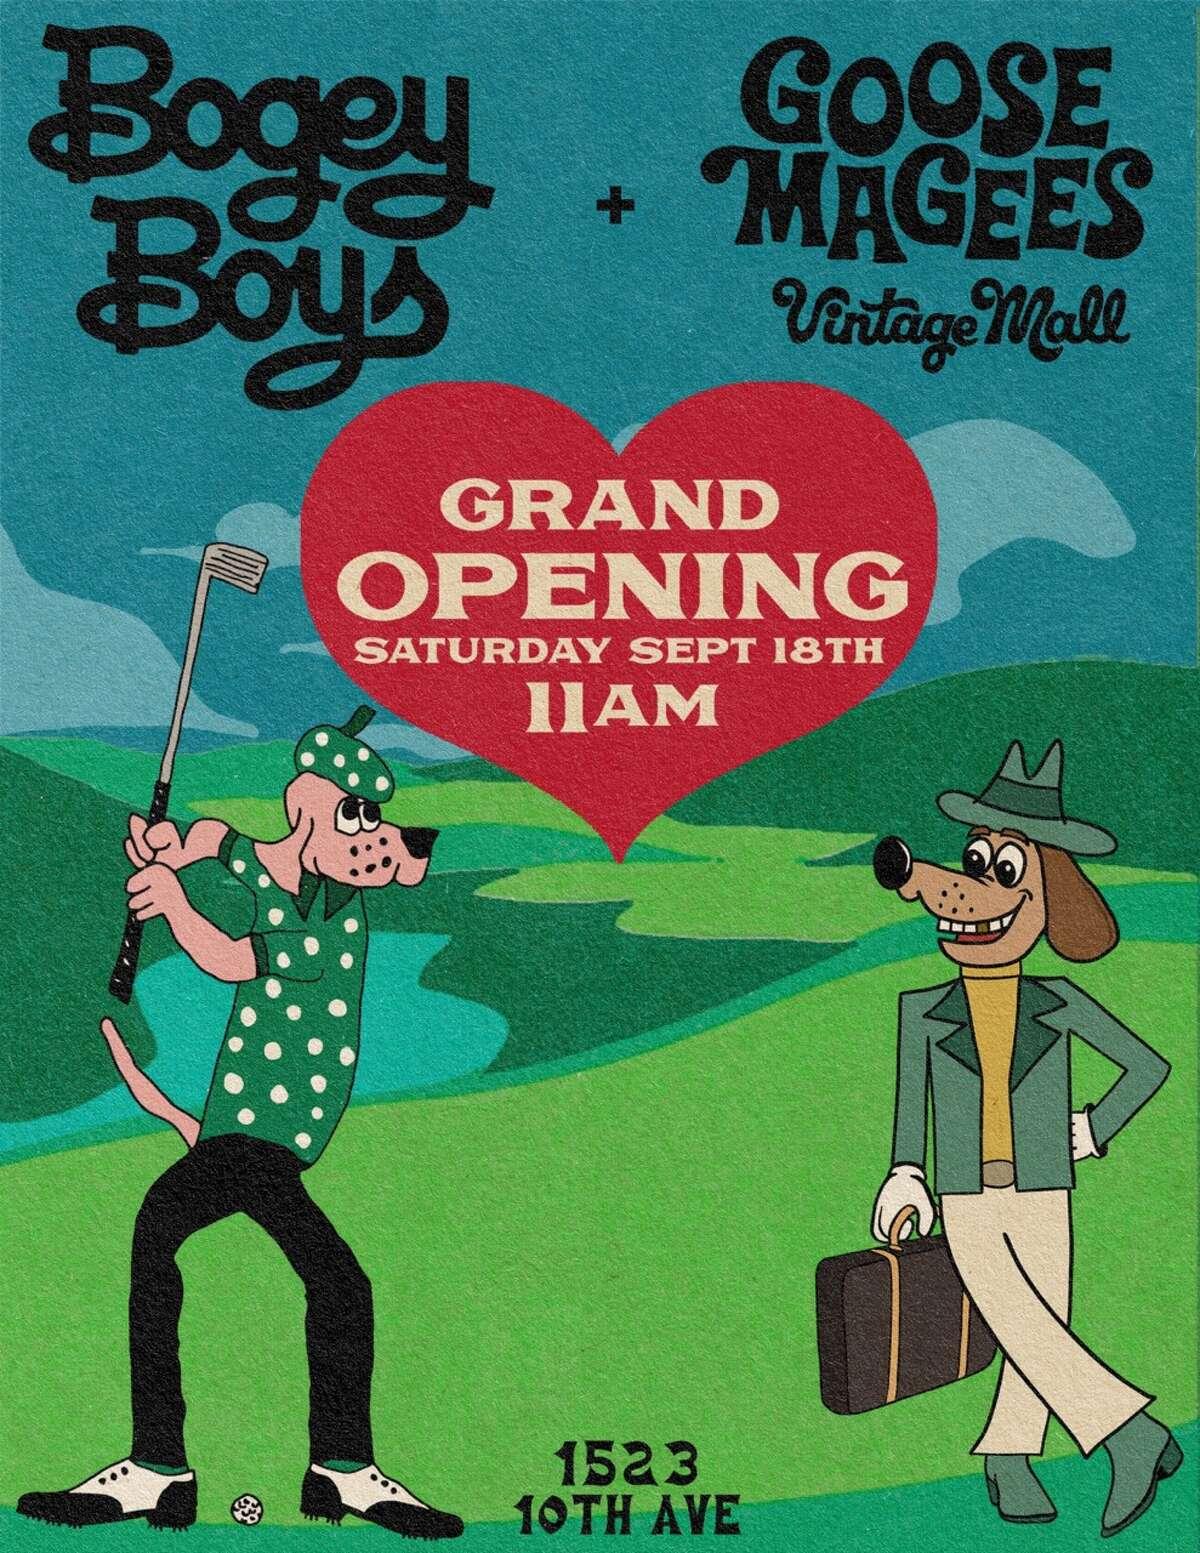 Bogey Boys Grand Opening Flyer